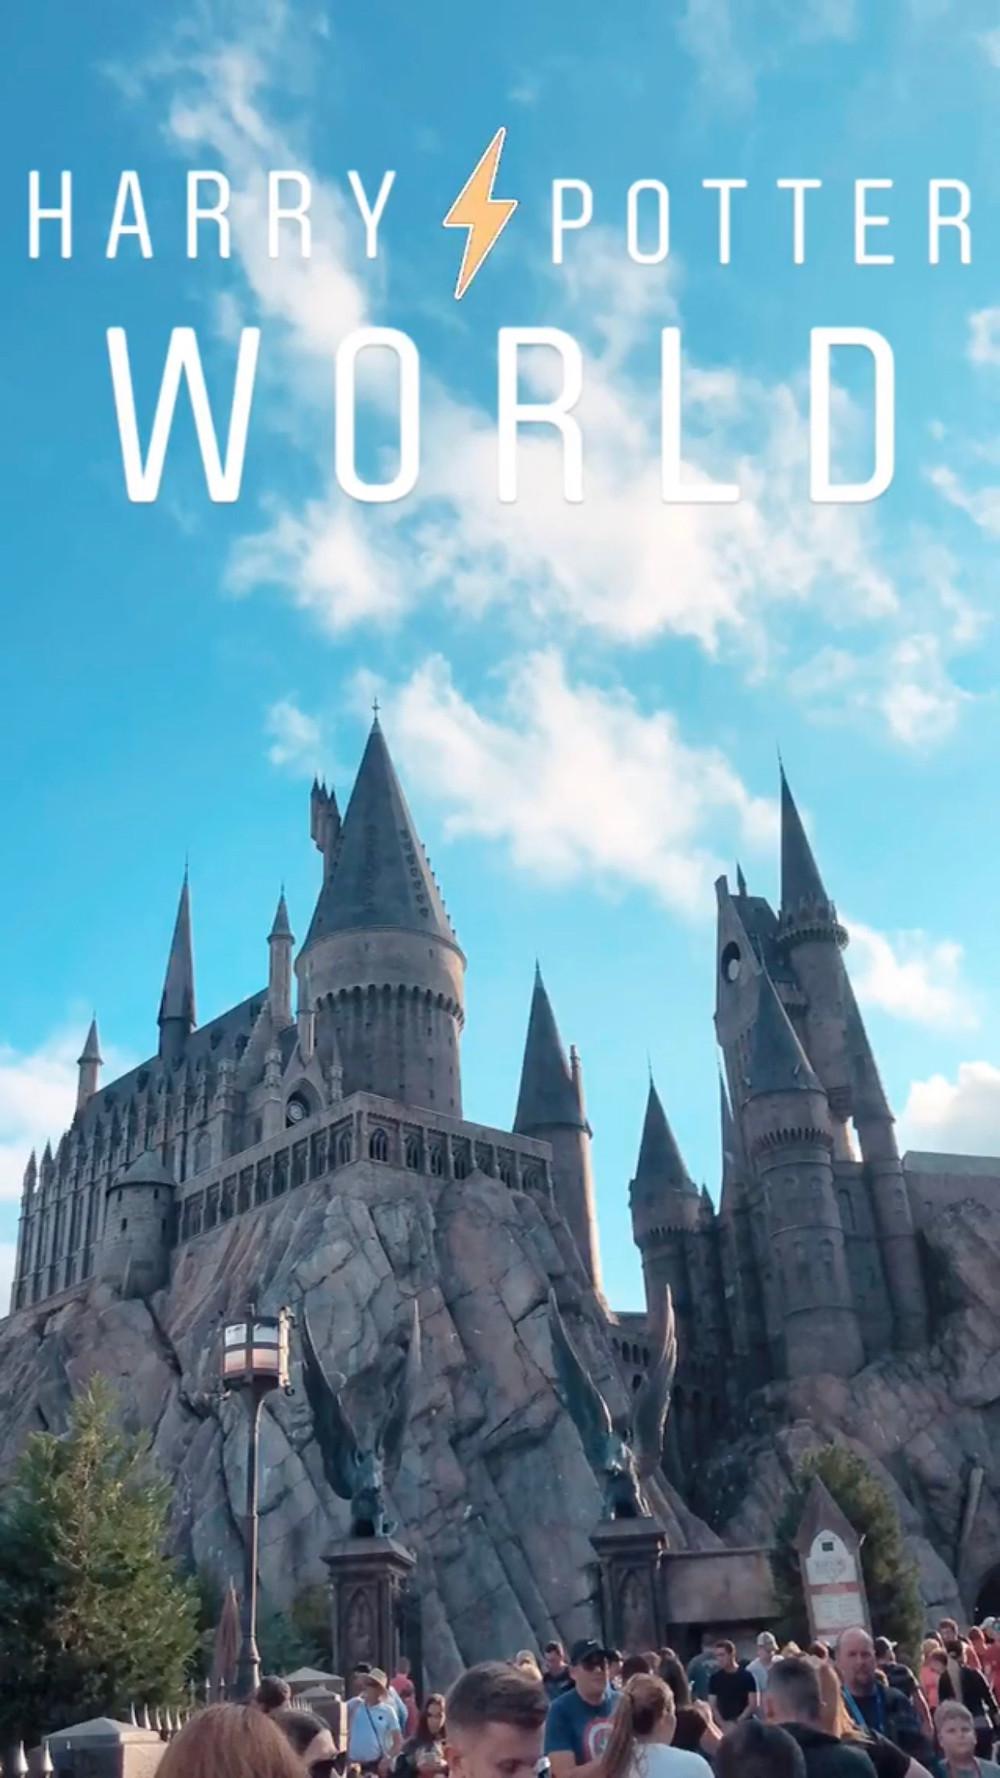 Harry Potter World Instagram Story